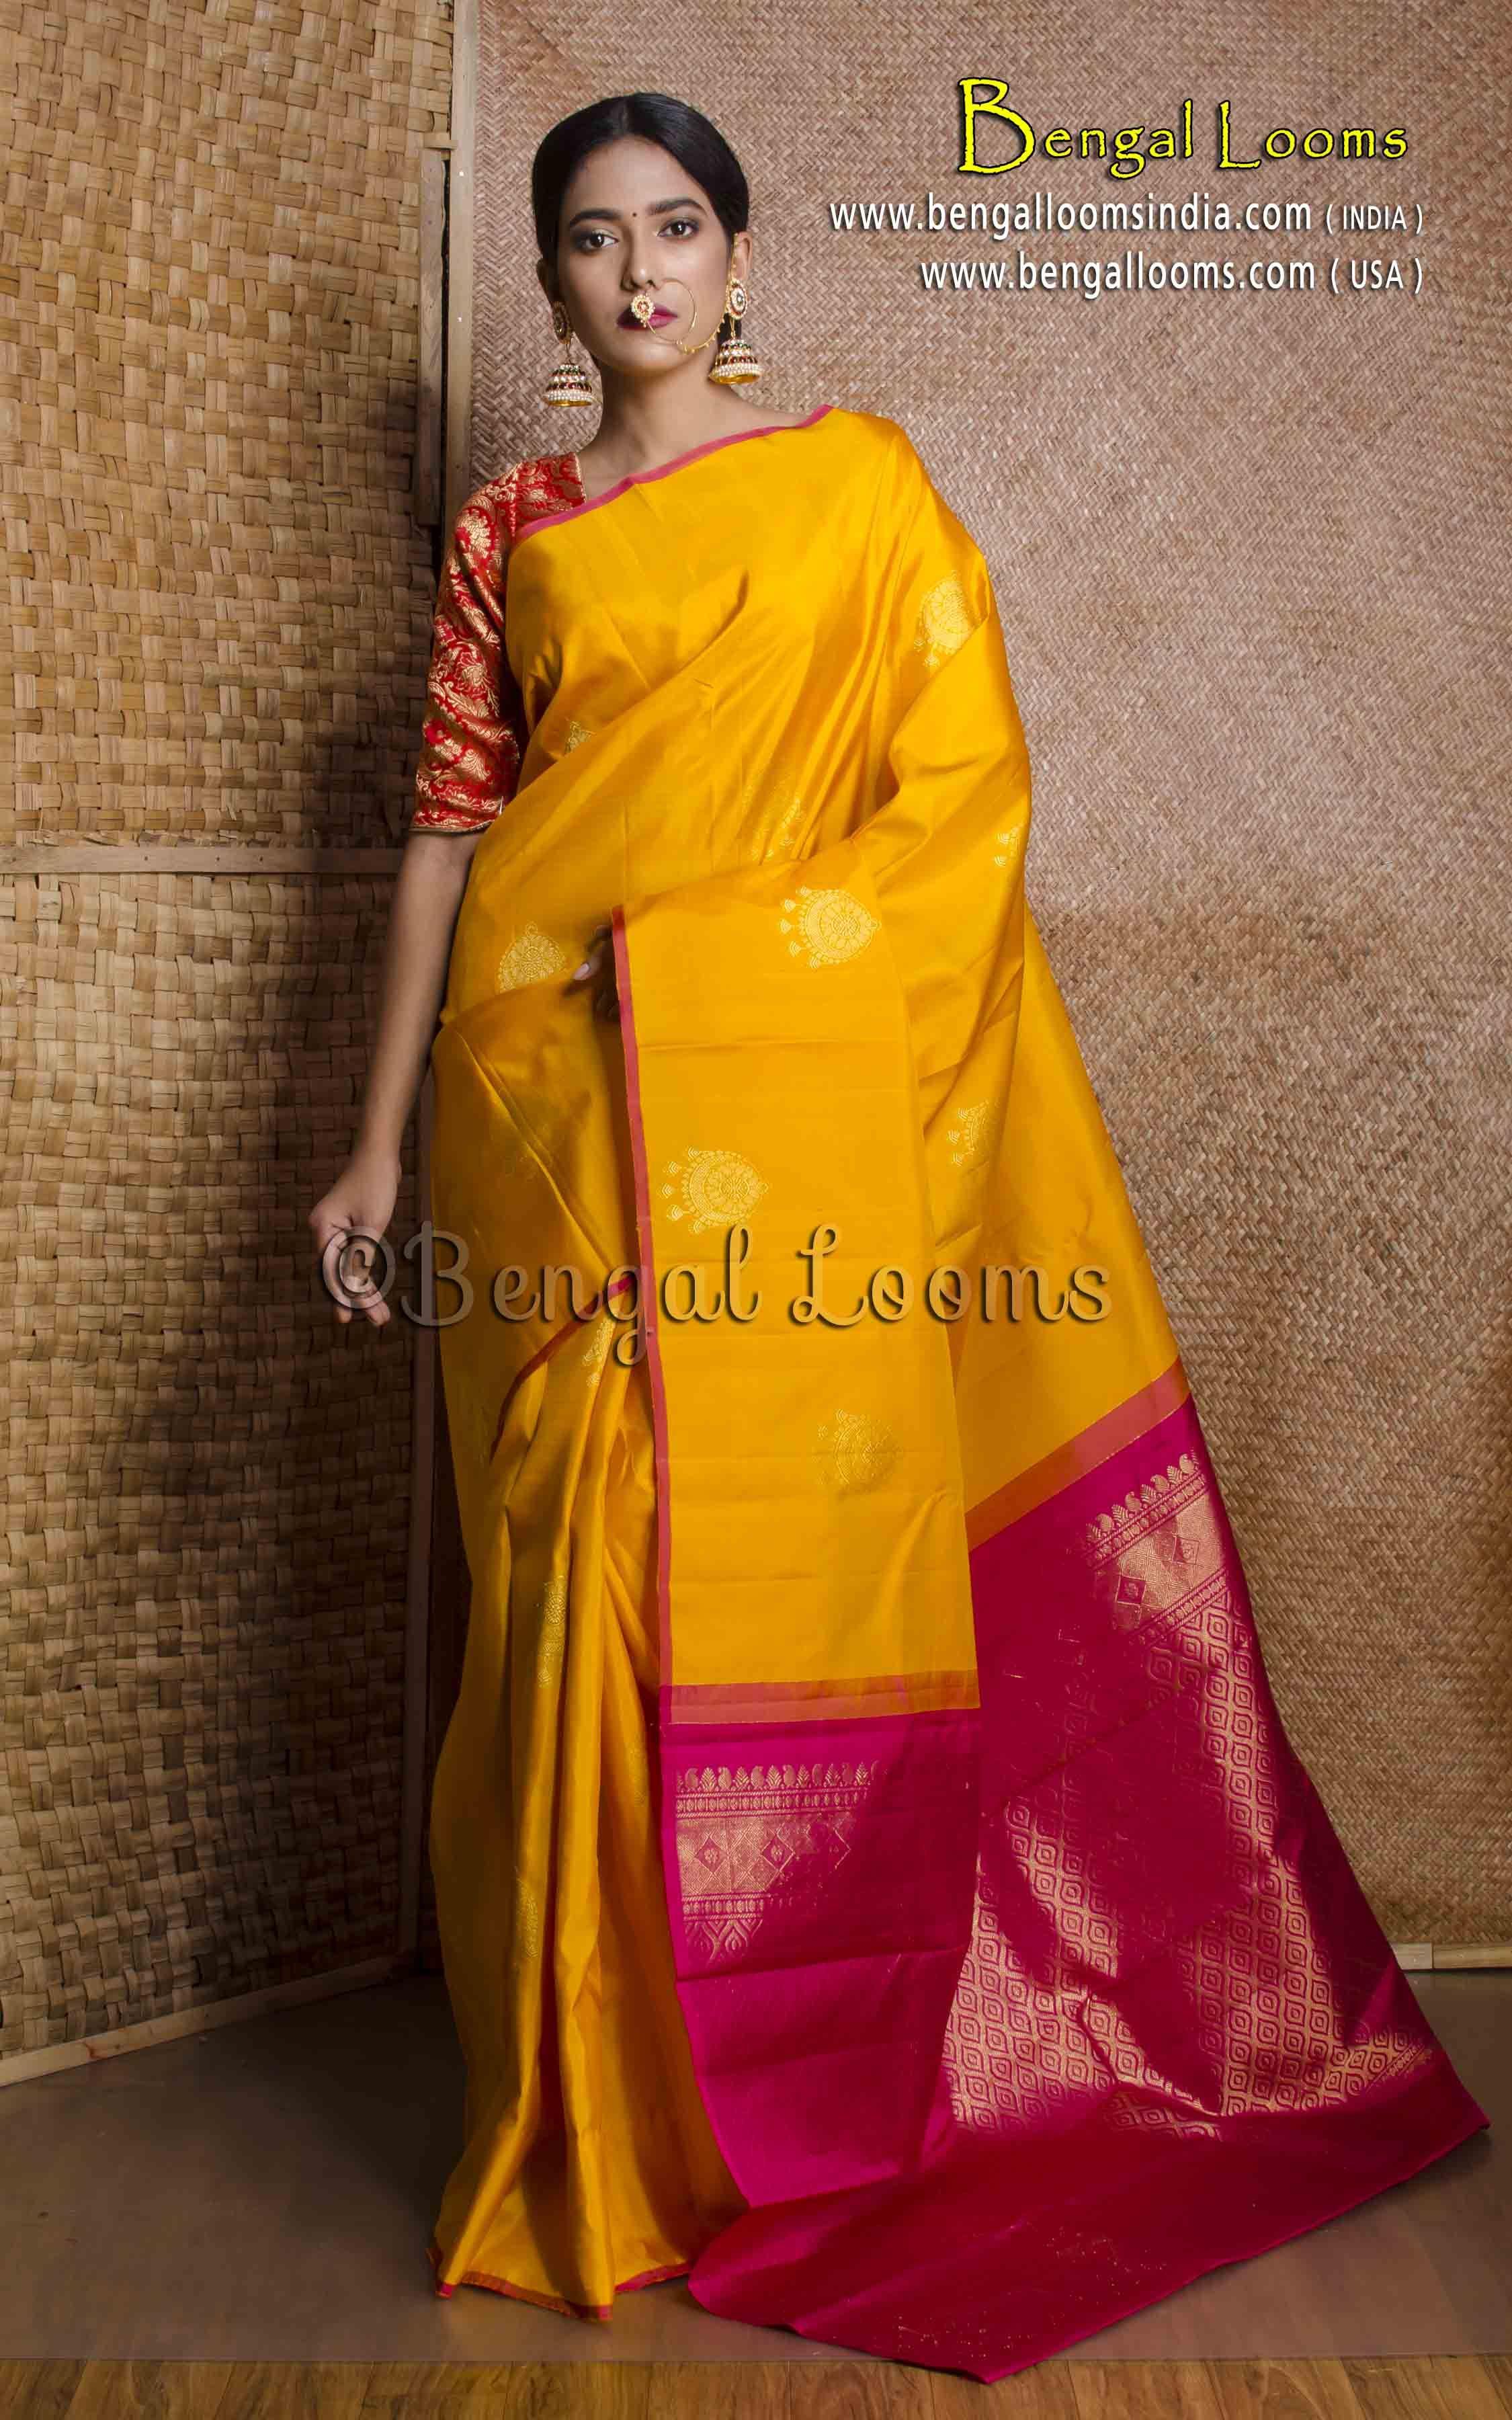 b3a2c738f7305 Pure Handloom Kanjivaram Saree in Turmeric Yellow and Rani